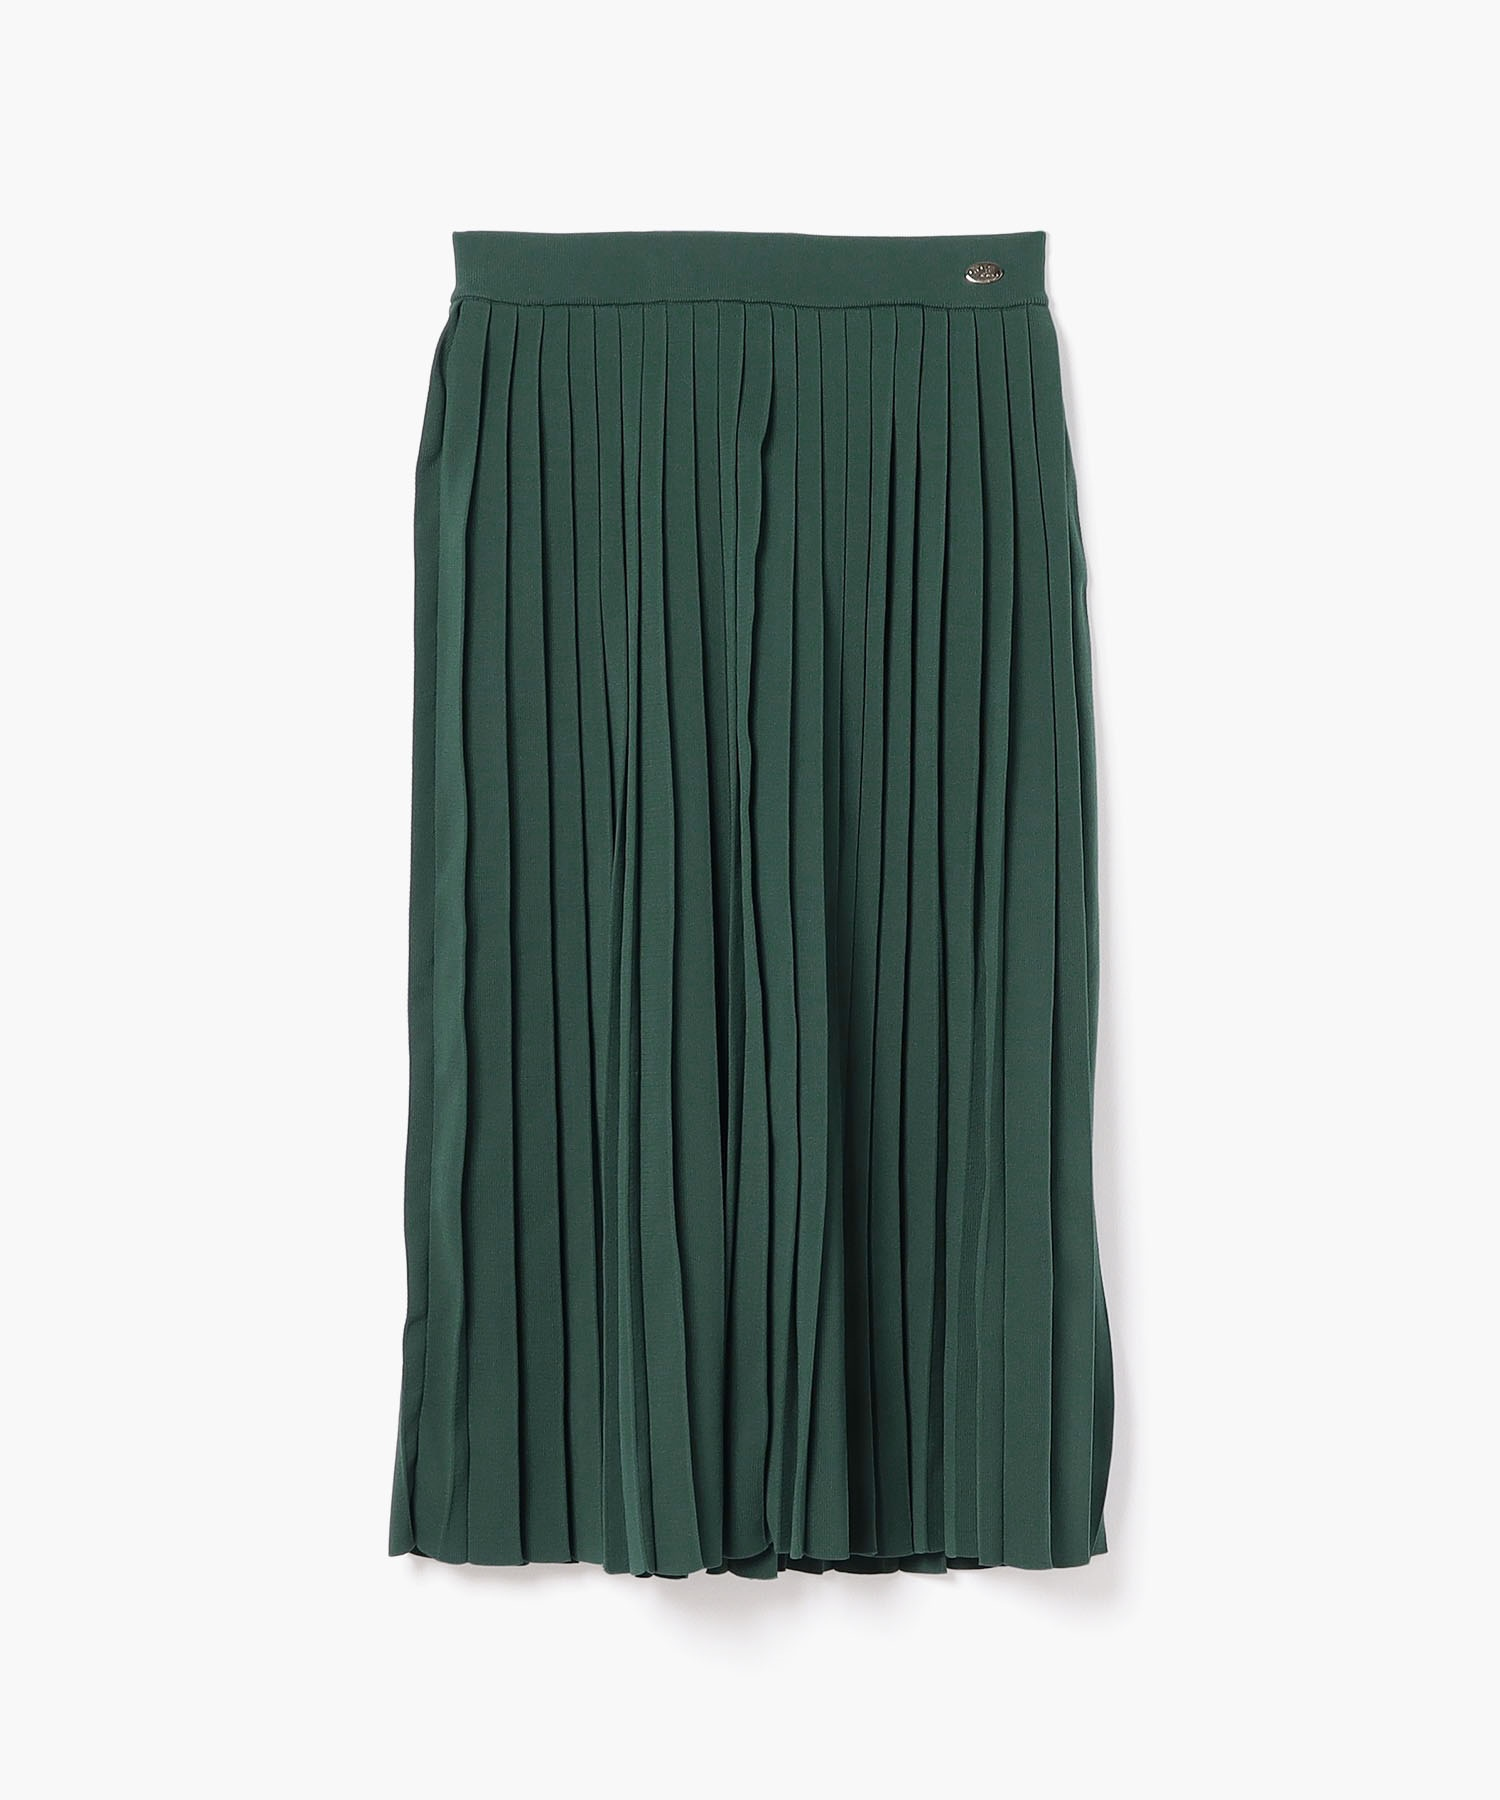 WQ58 JUPE ニットプリーツスカート